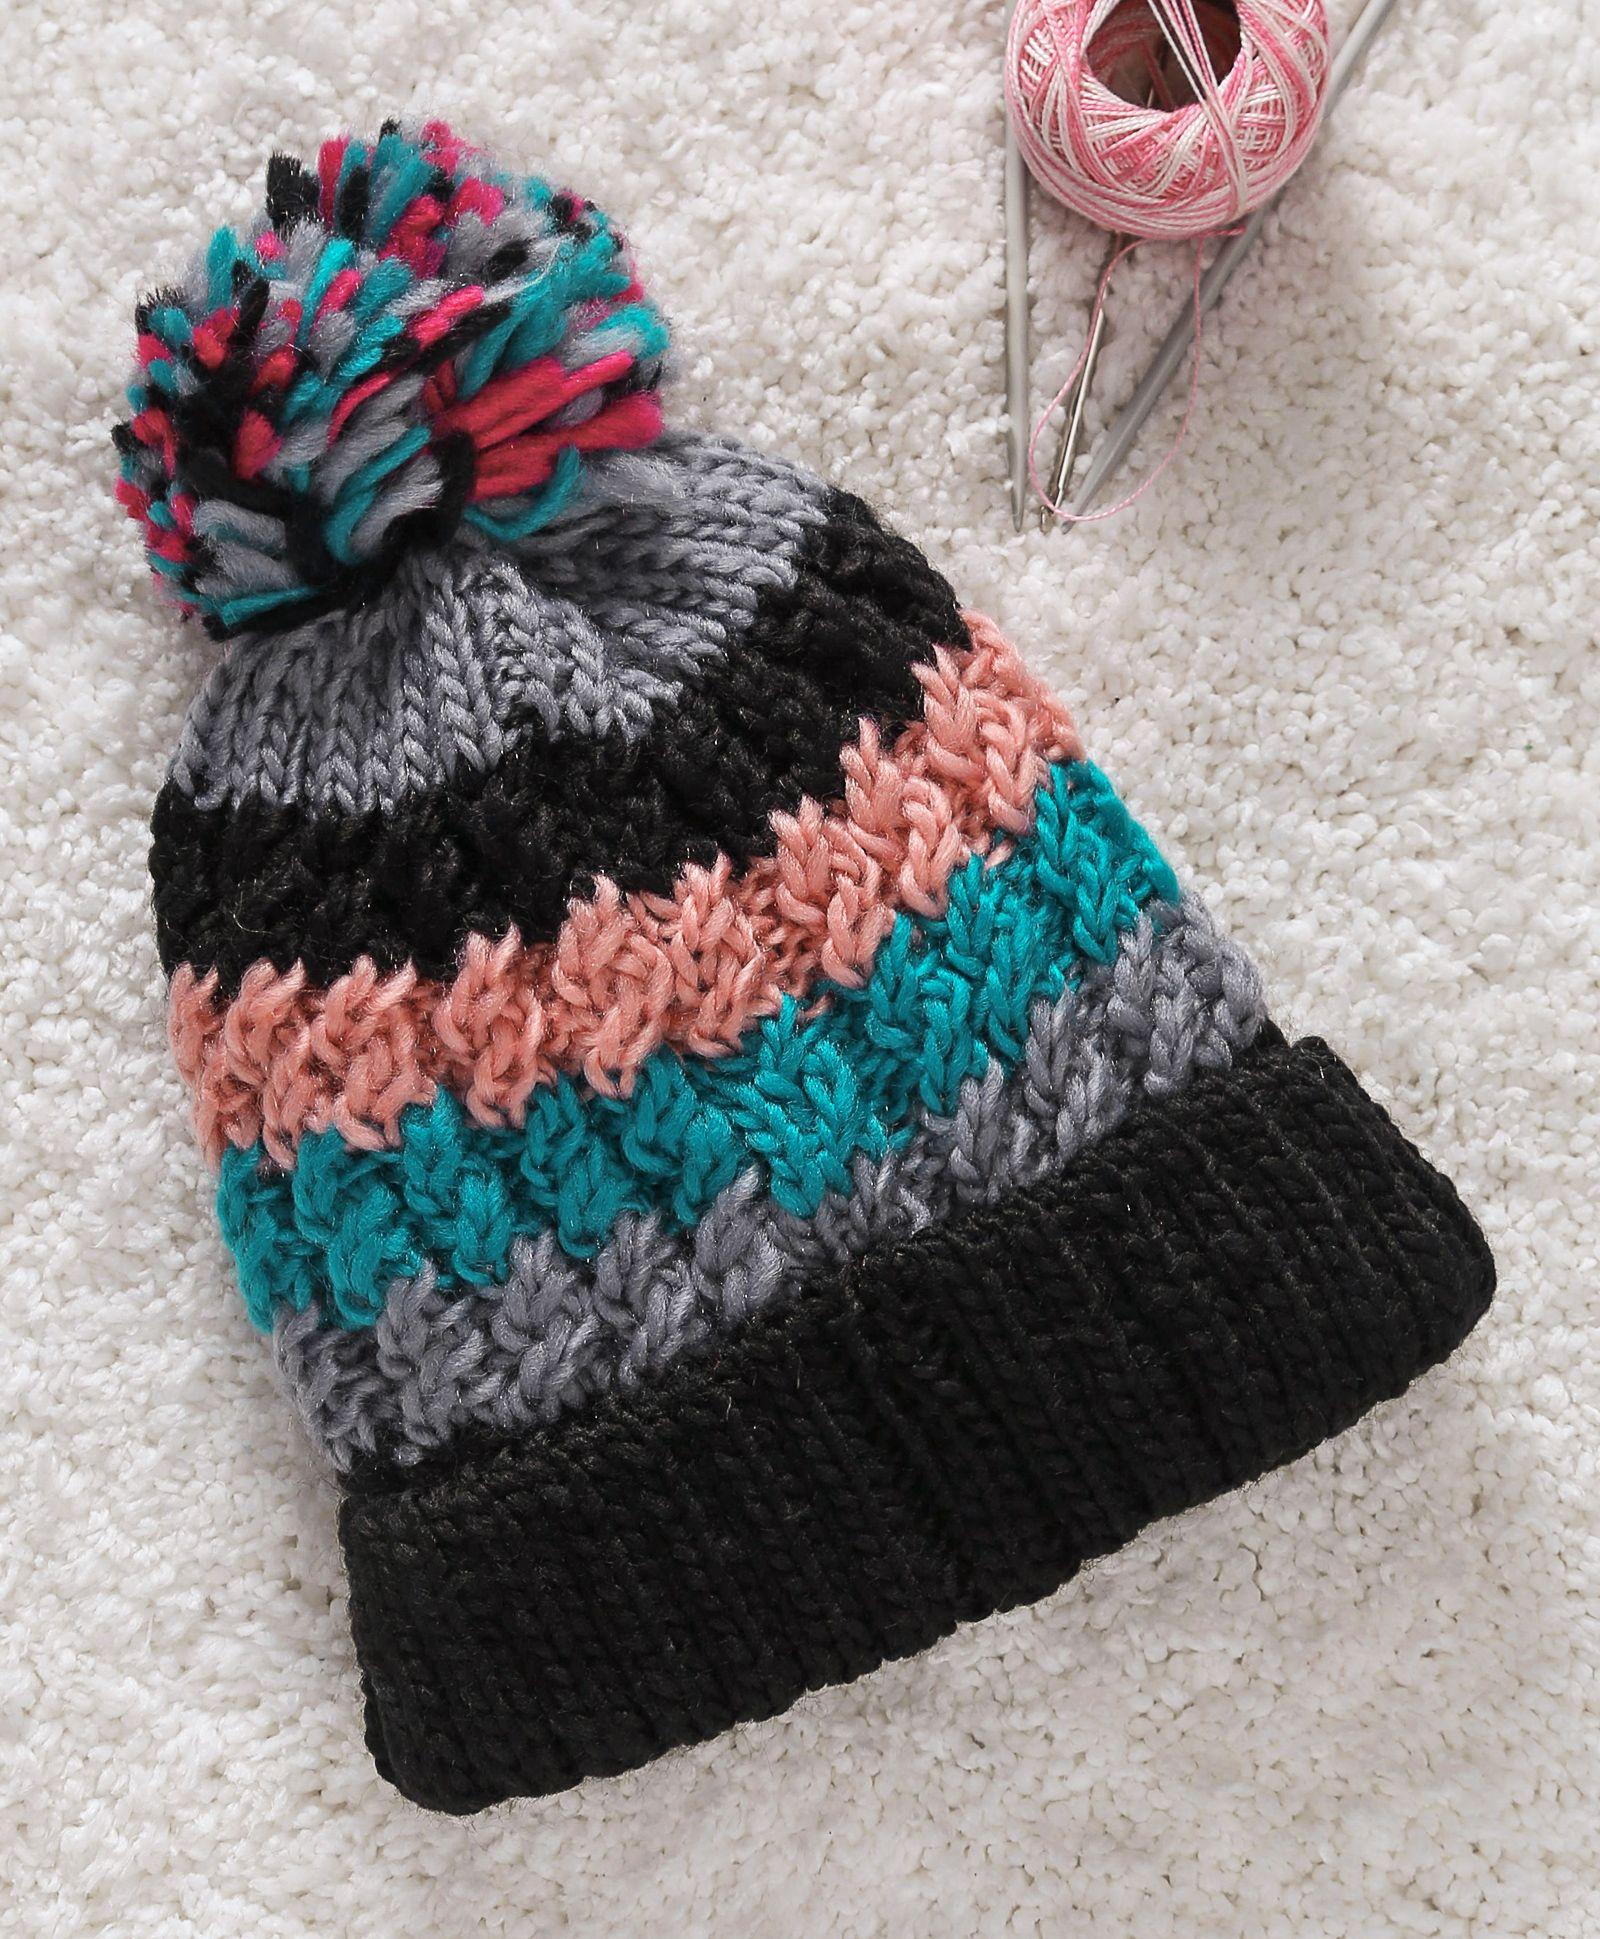 0e8a55a390f Babyhug Winter Wear Cap With Pom Pom Motif Black Online in India ...